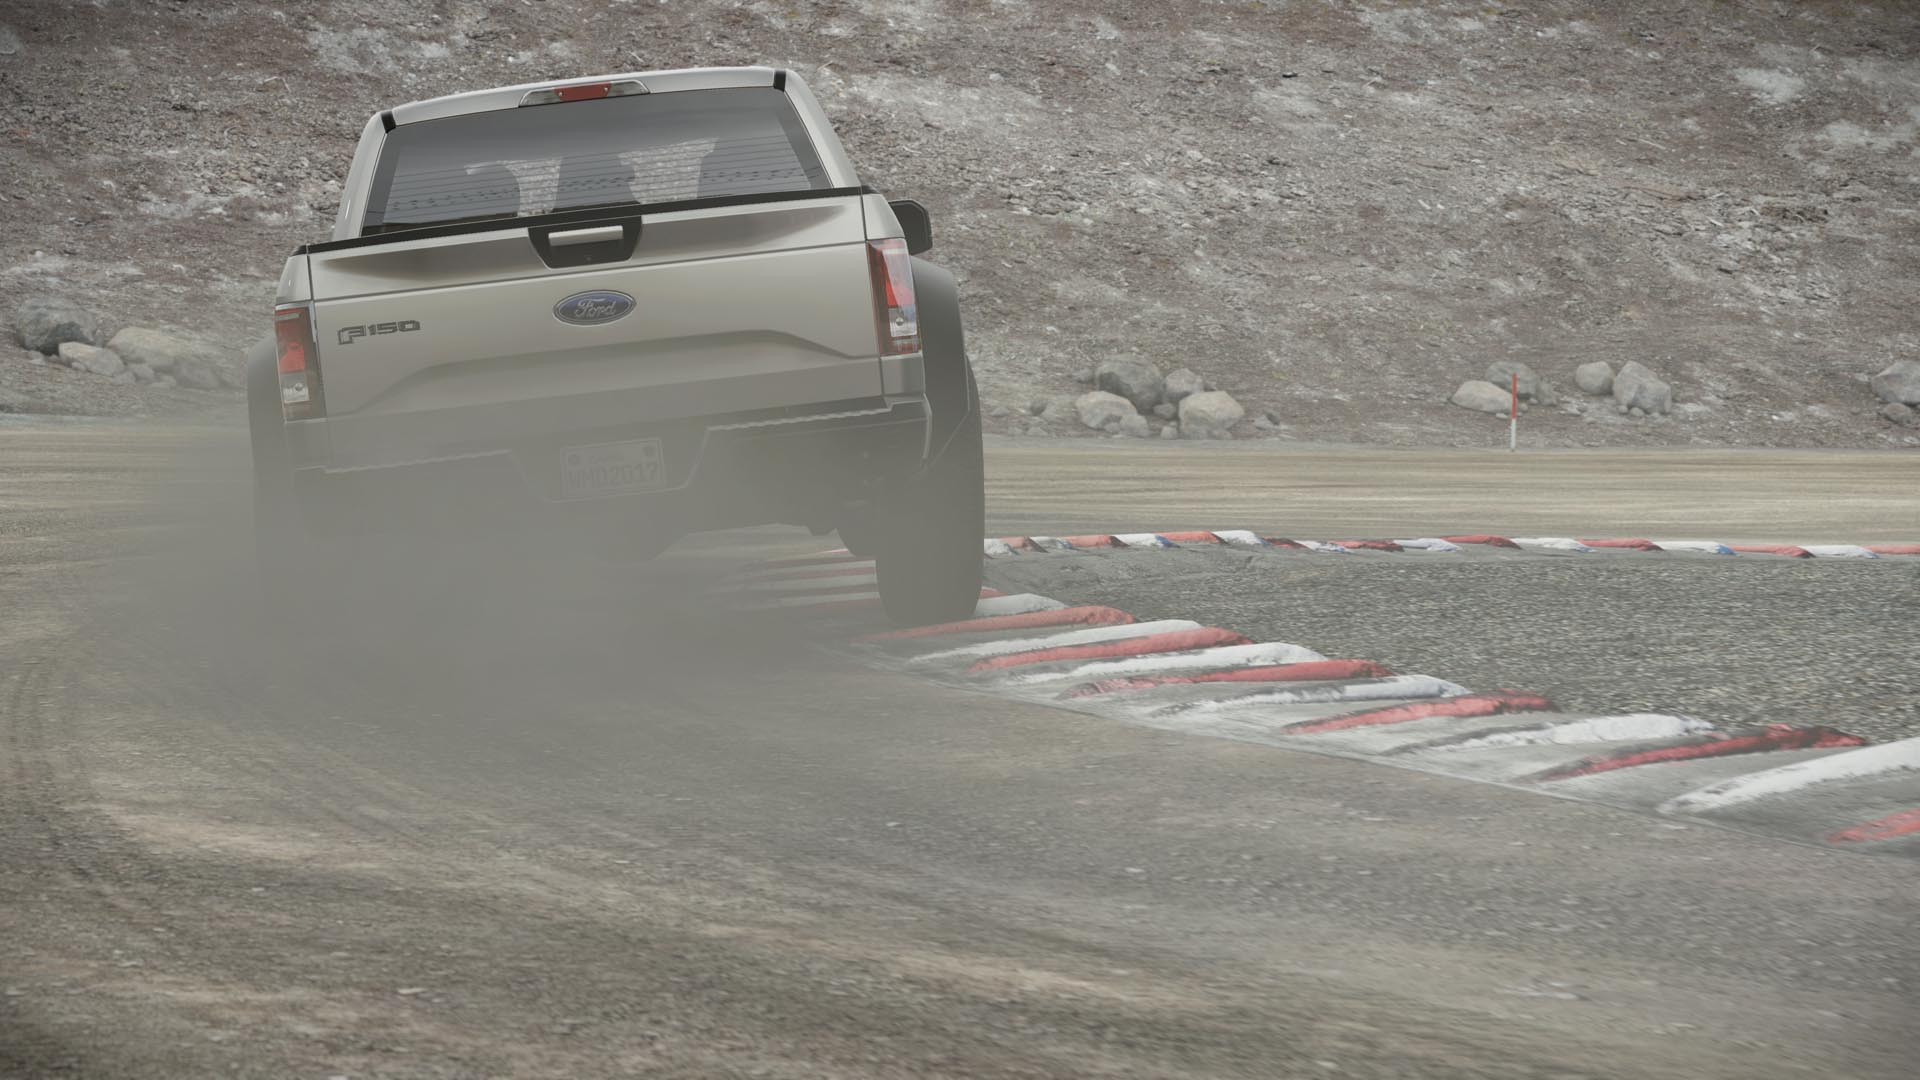 Ford_F150_Funhaver_-_Hell_Rallycross_1486042521